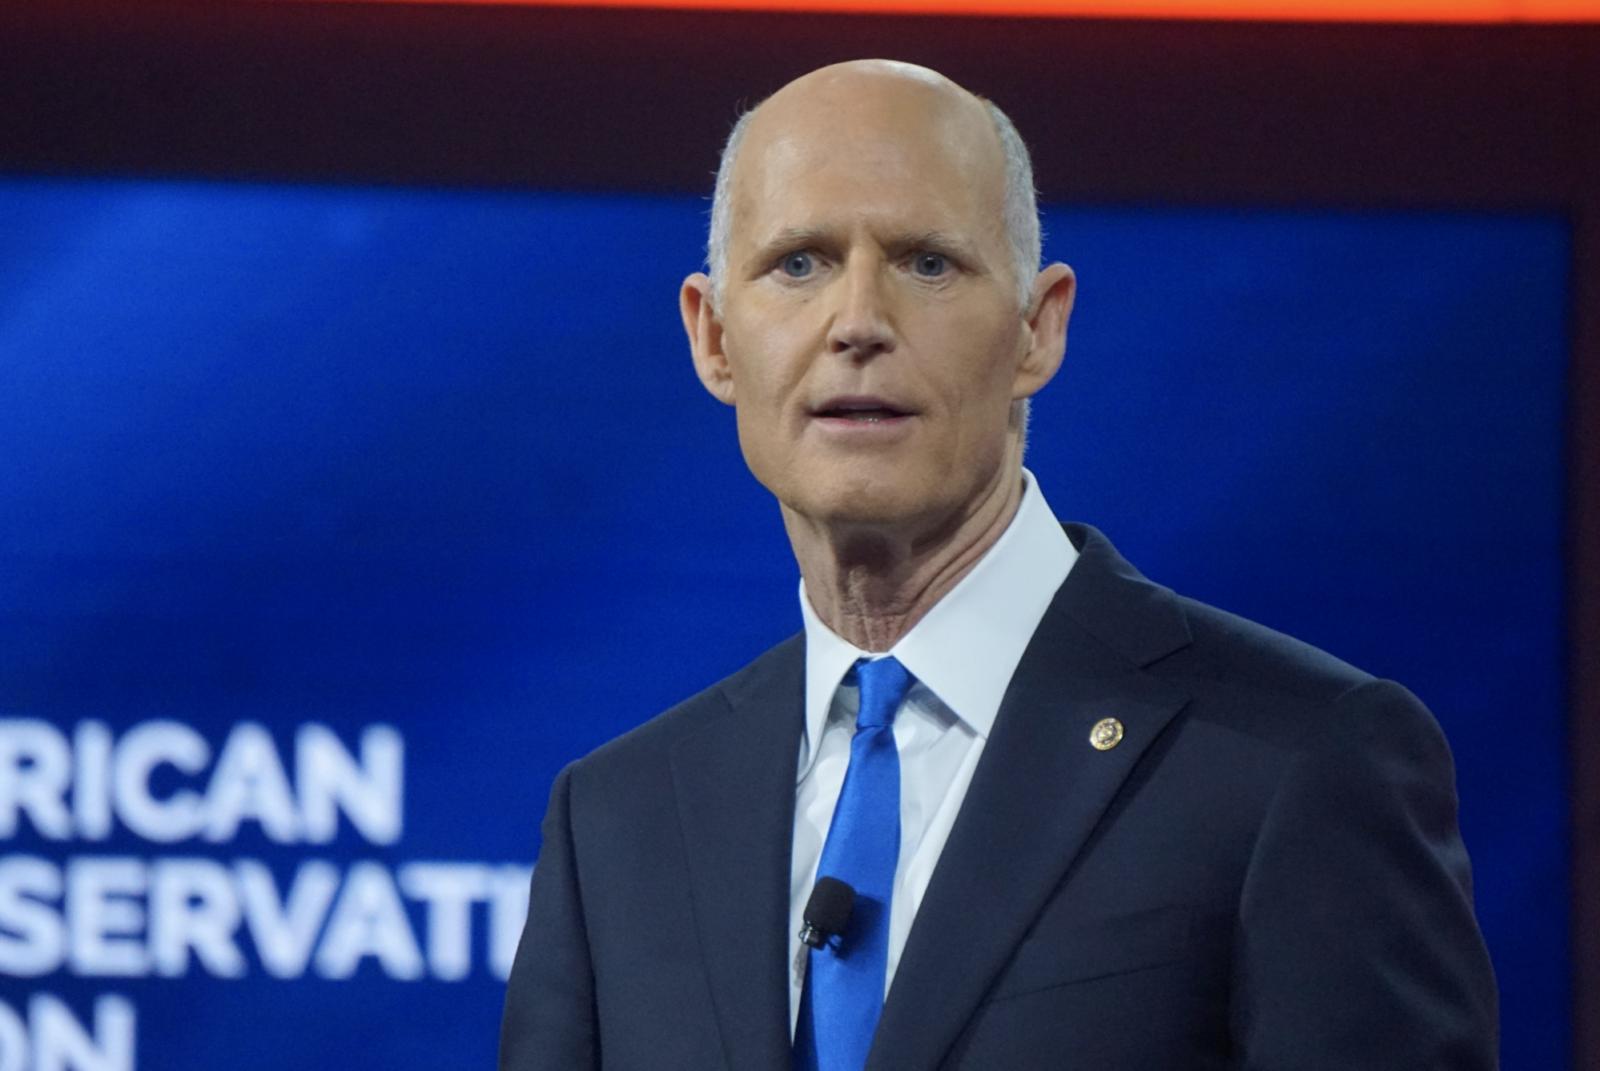 Sen Scott says Rep. Stephanie Murphy can't beat Marco Rubio